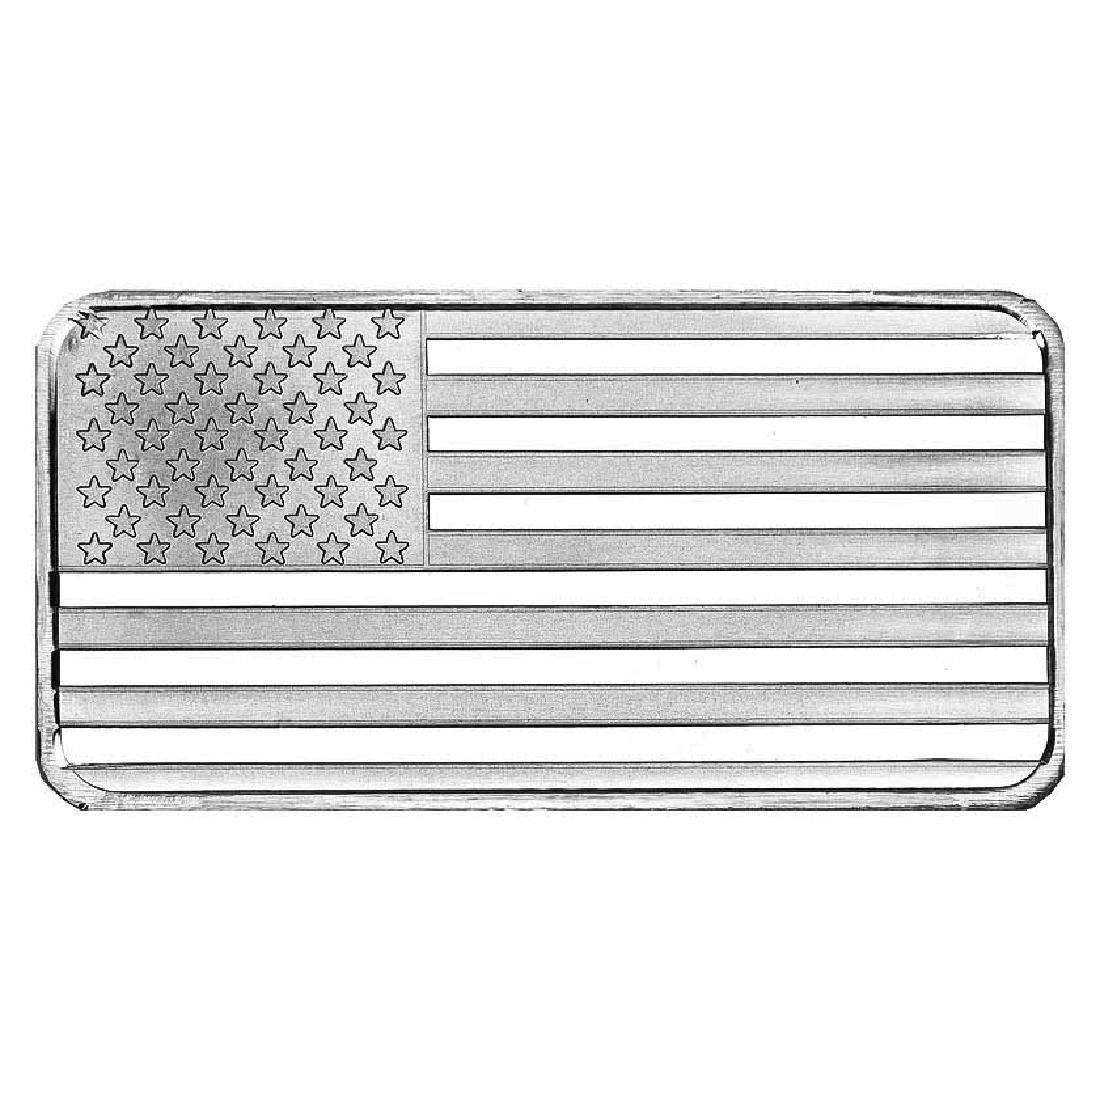 SilverTowne 10 oz Silver Bar - Flag Design